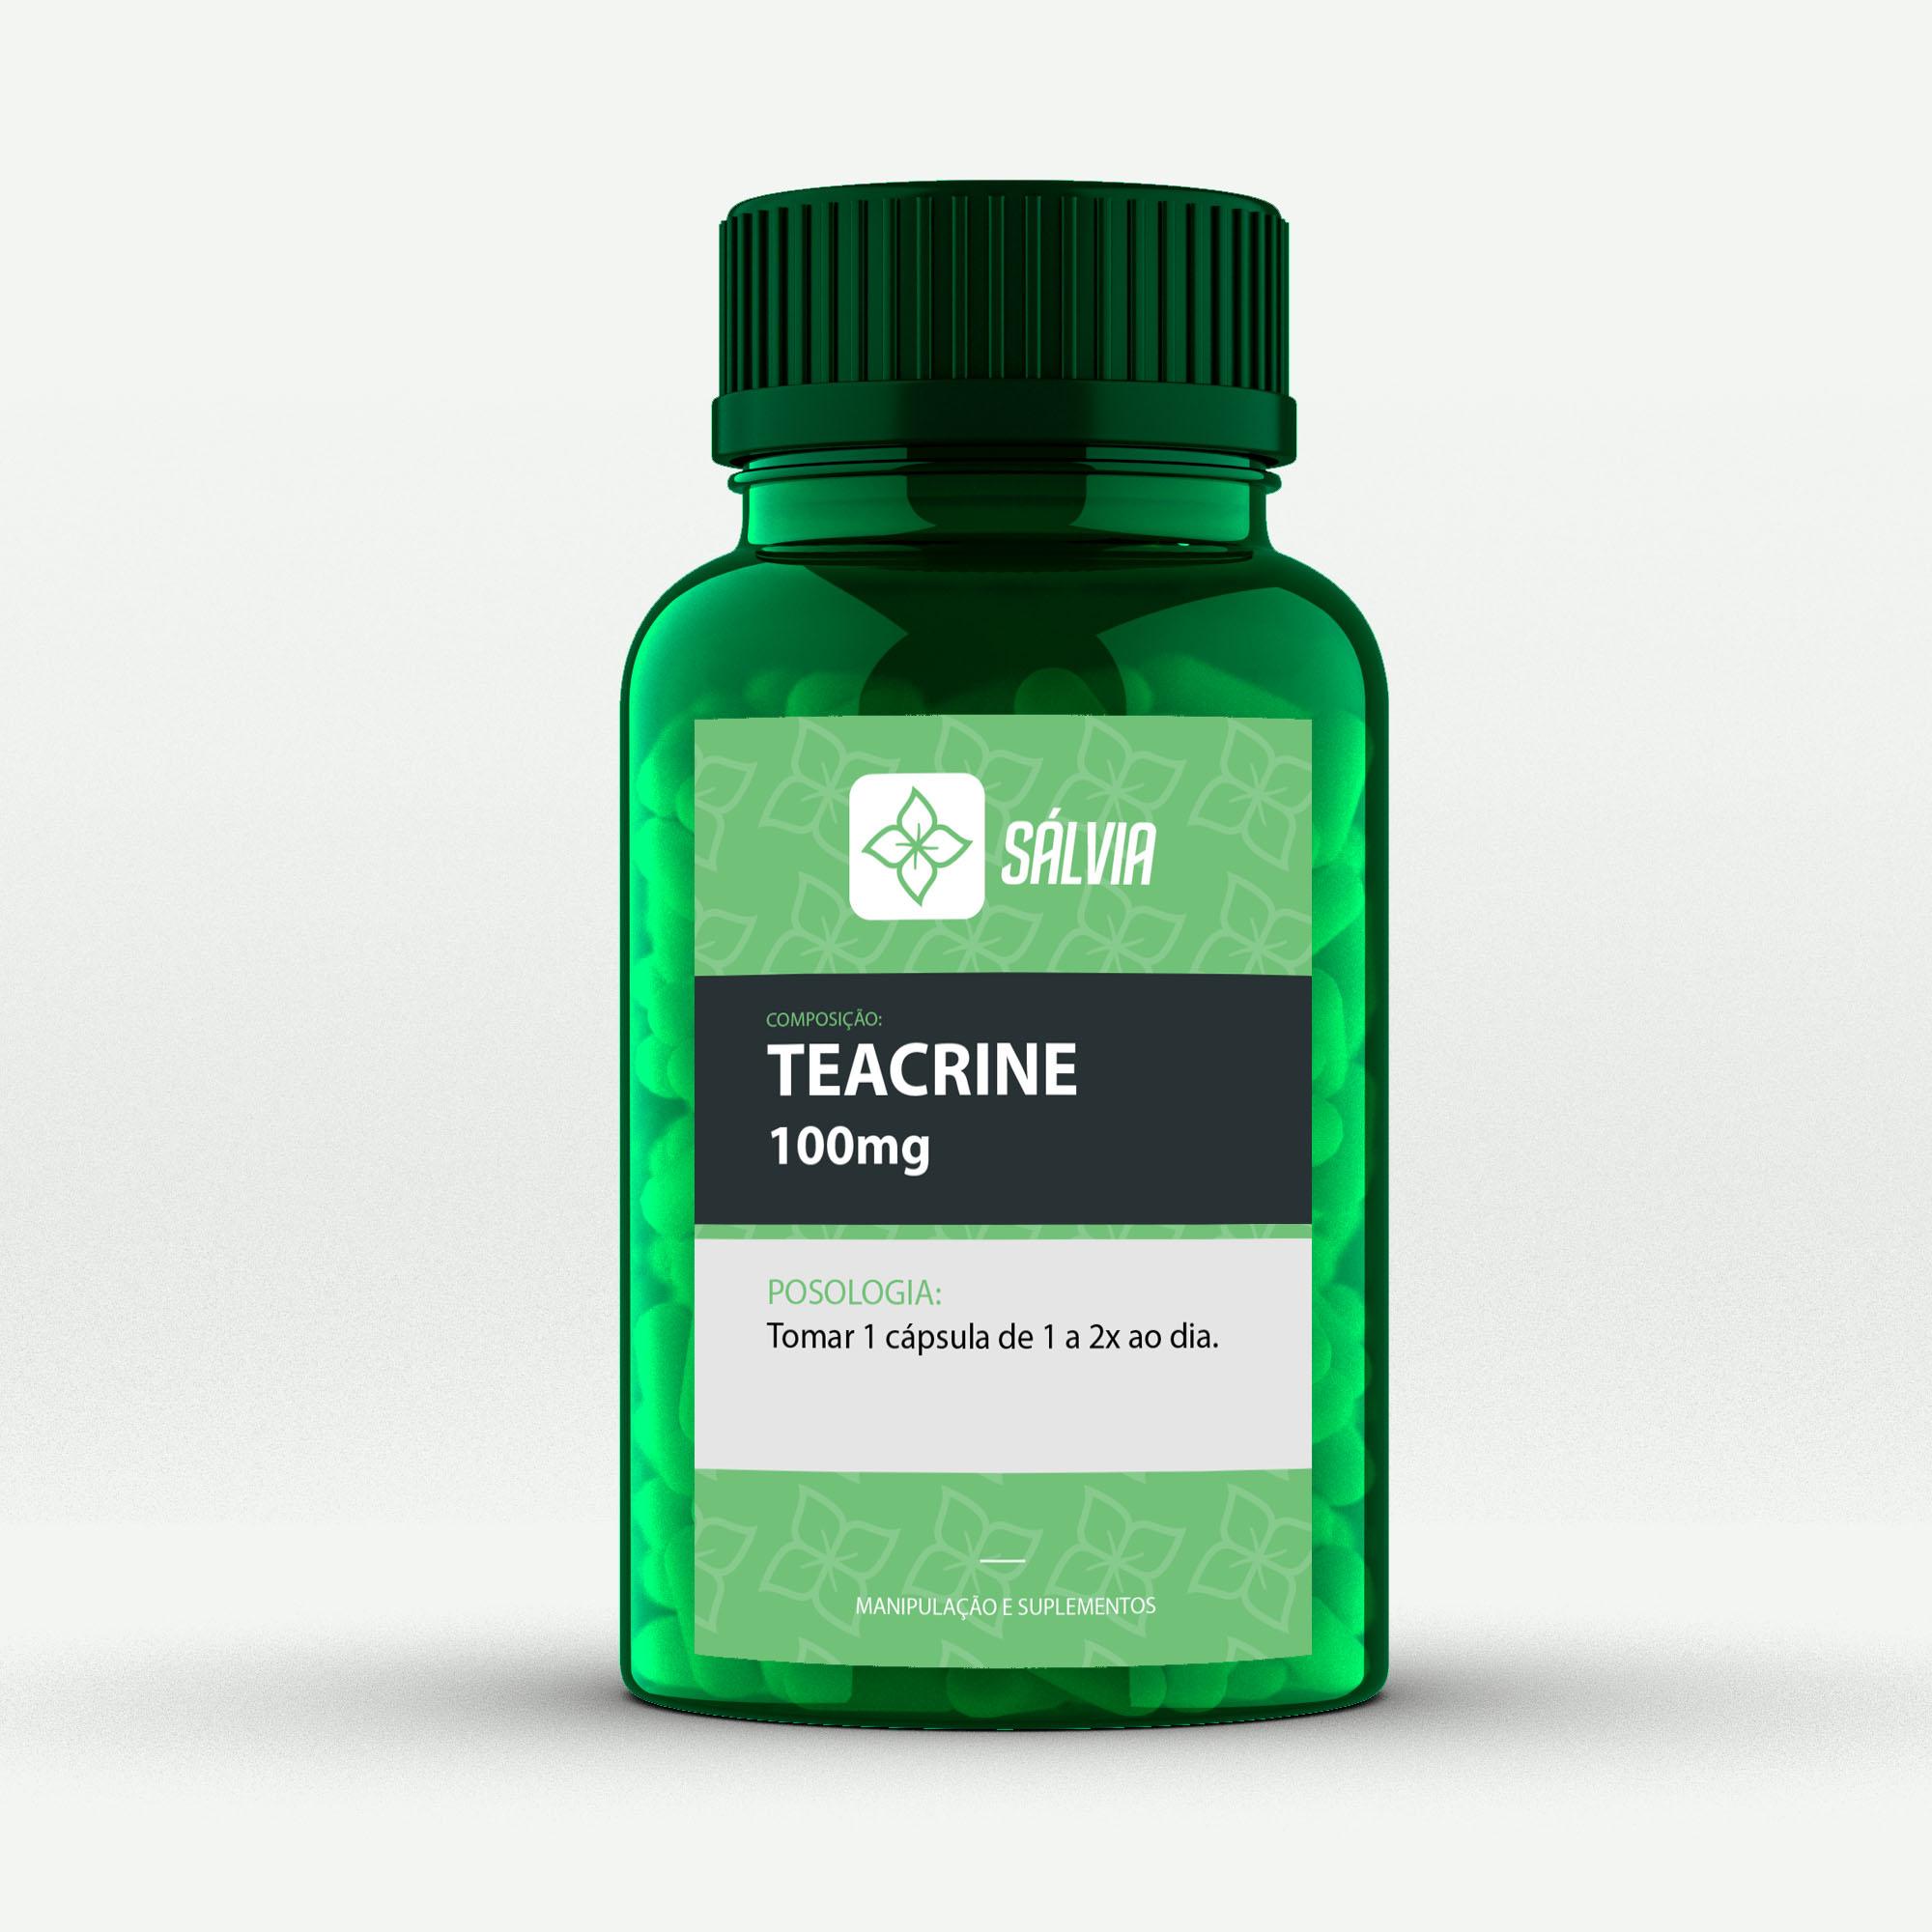 TEACRINE 100mg - Cápsulas